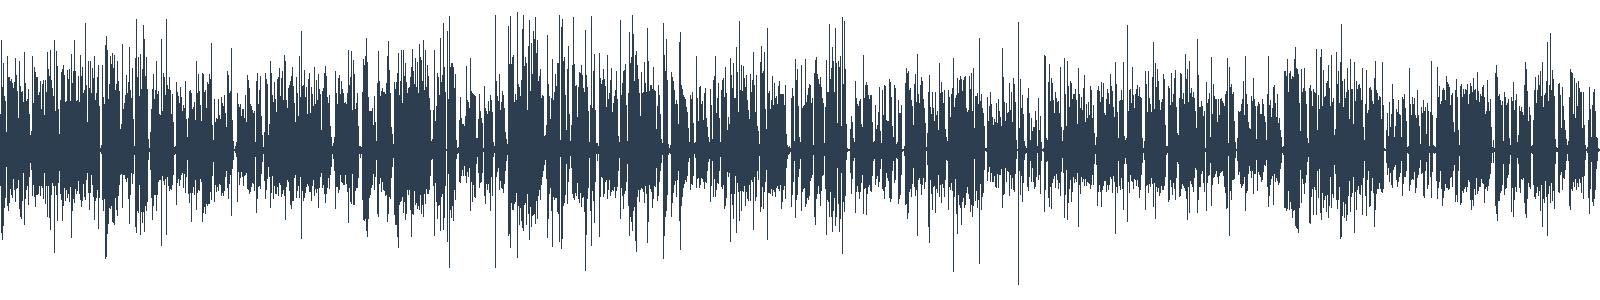 Zošidlo a lúpež v Zamuchlákoch waveform